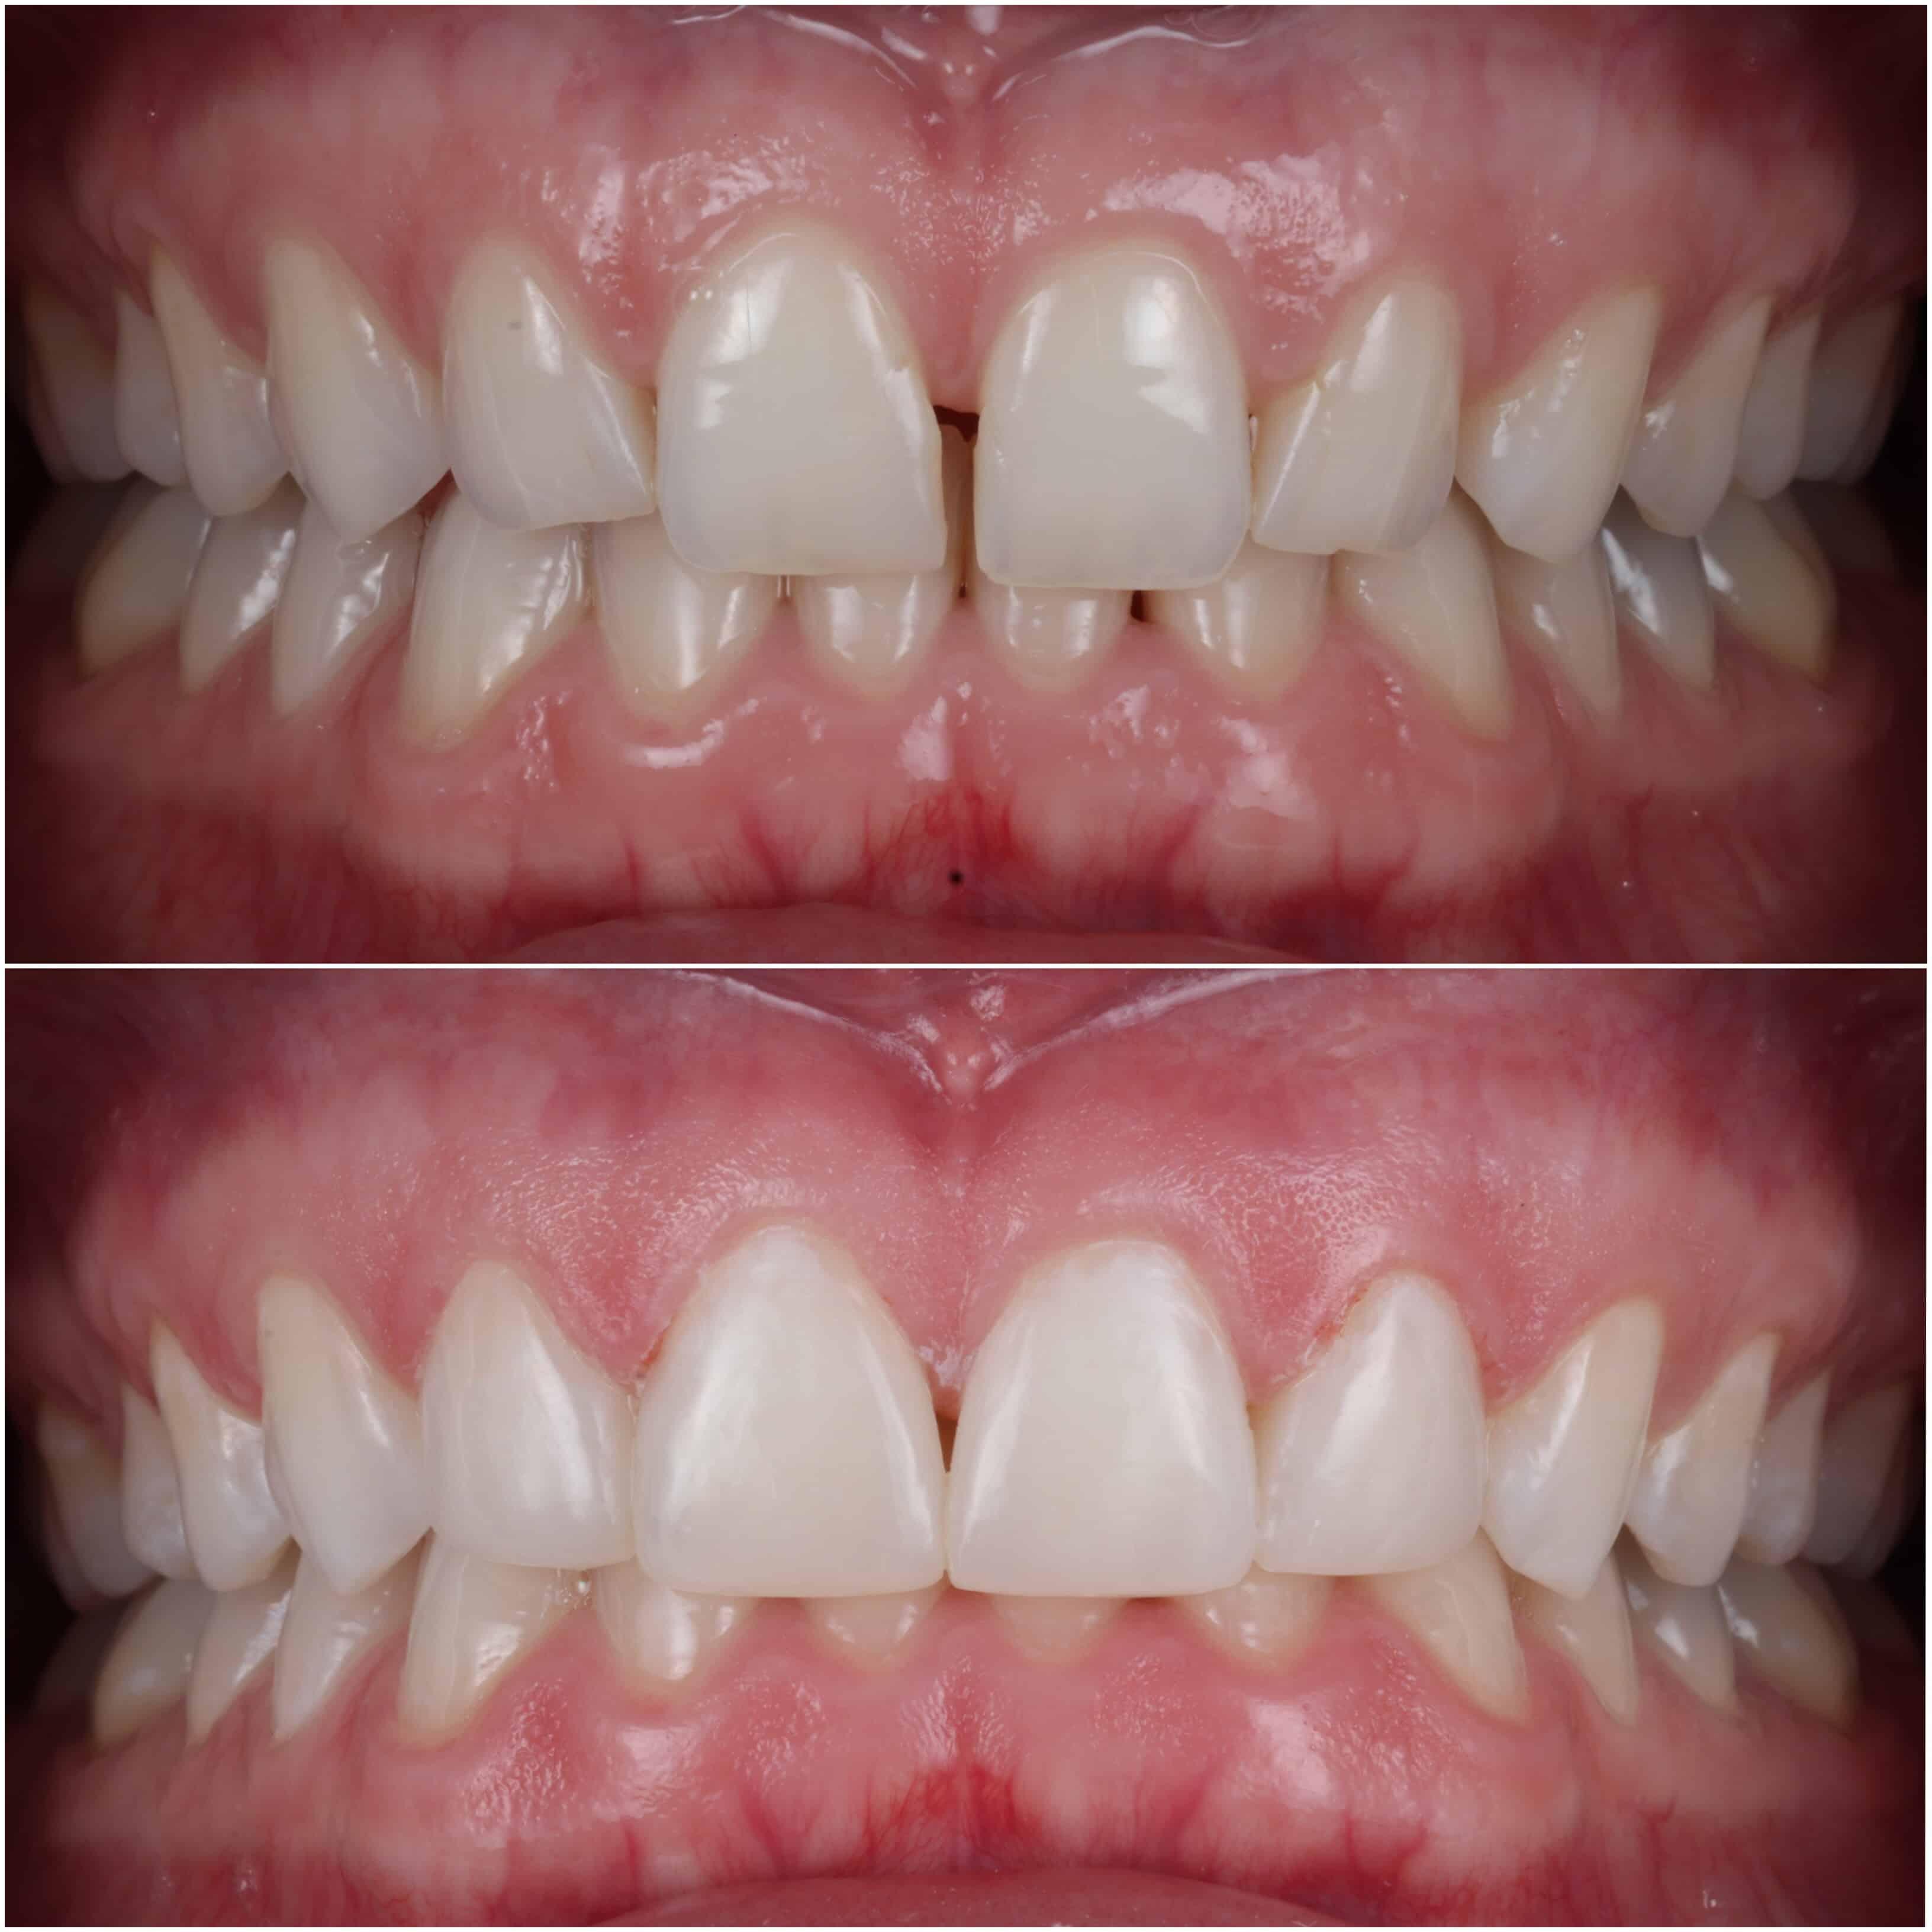 Composite Bonding To Close Tooth Gap By Dr Celine Higton At Beverley Dental Raynes Park London